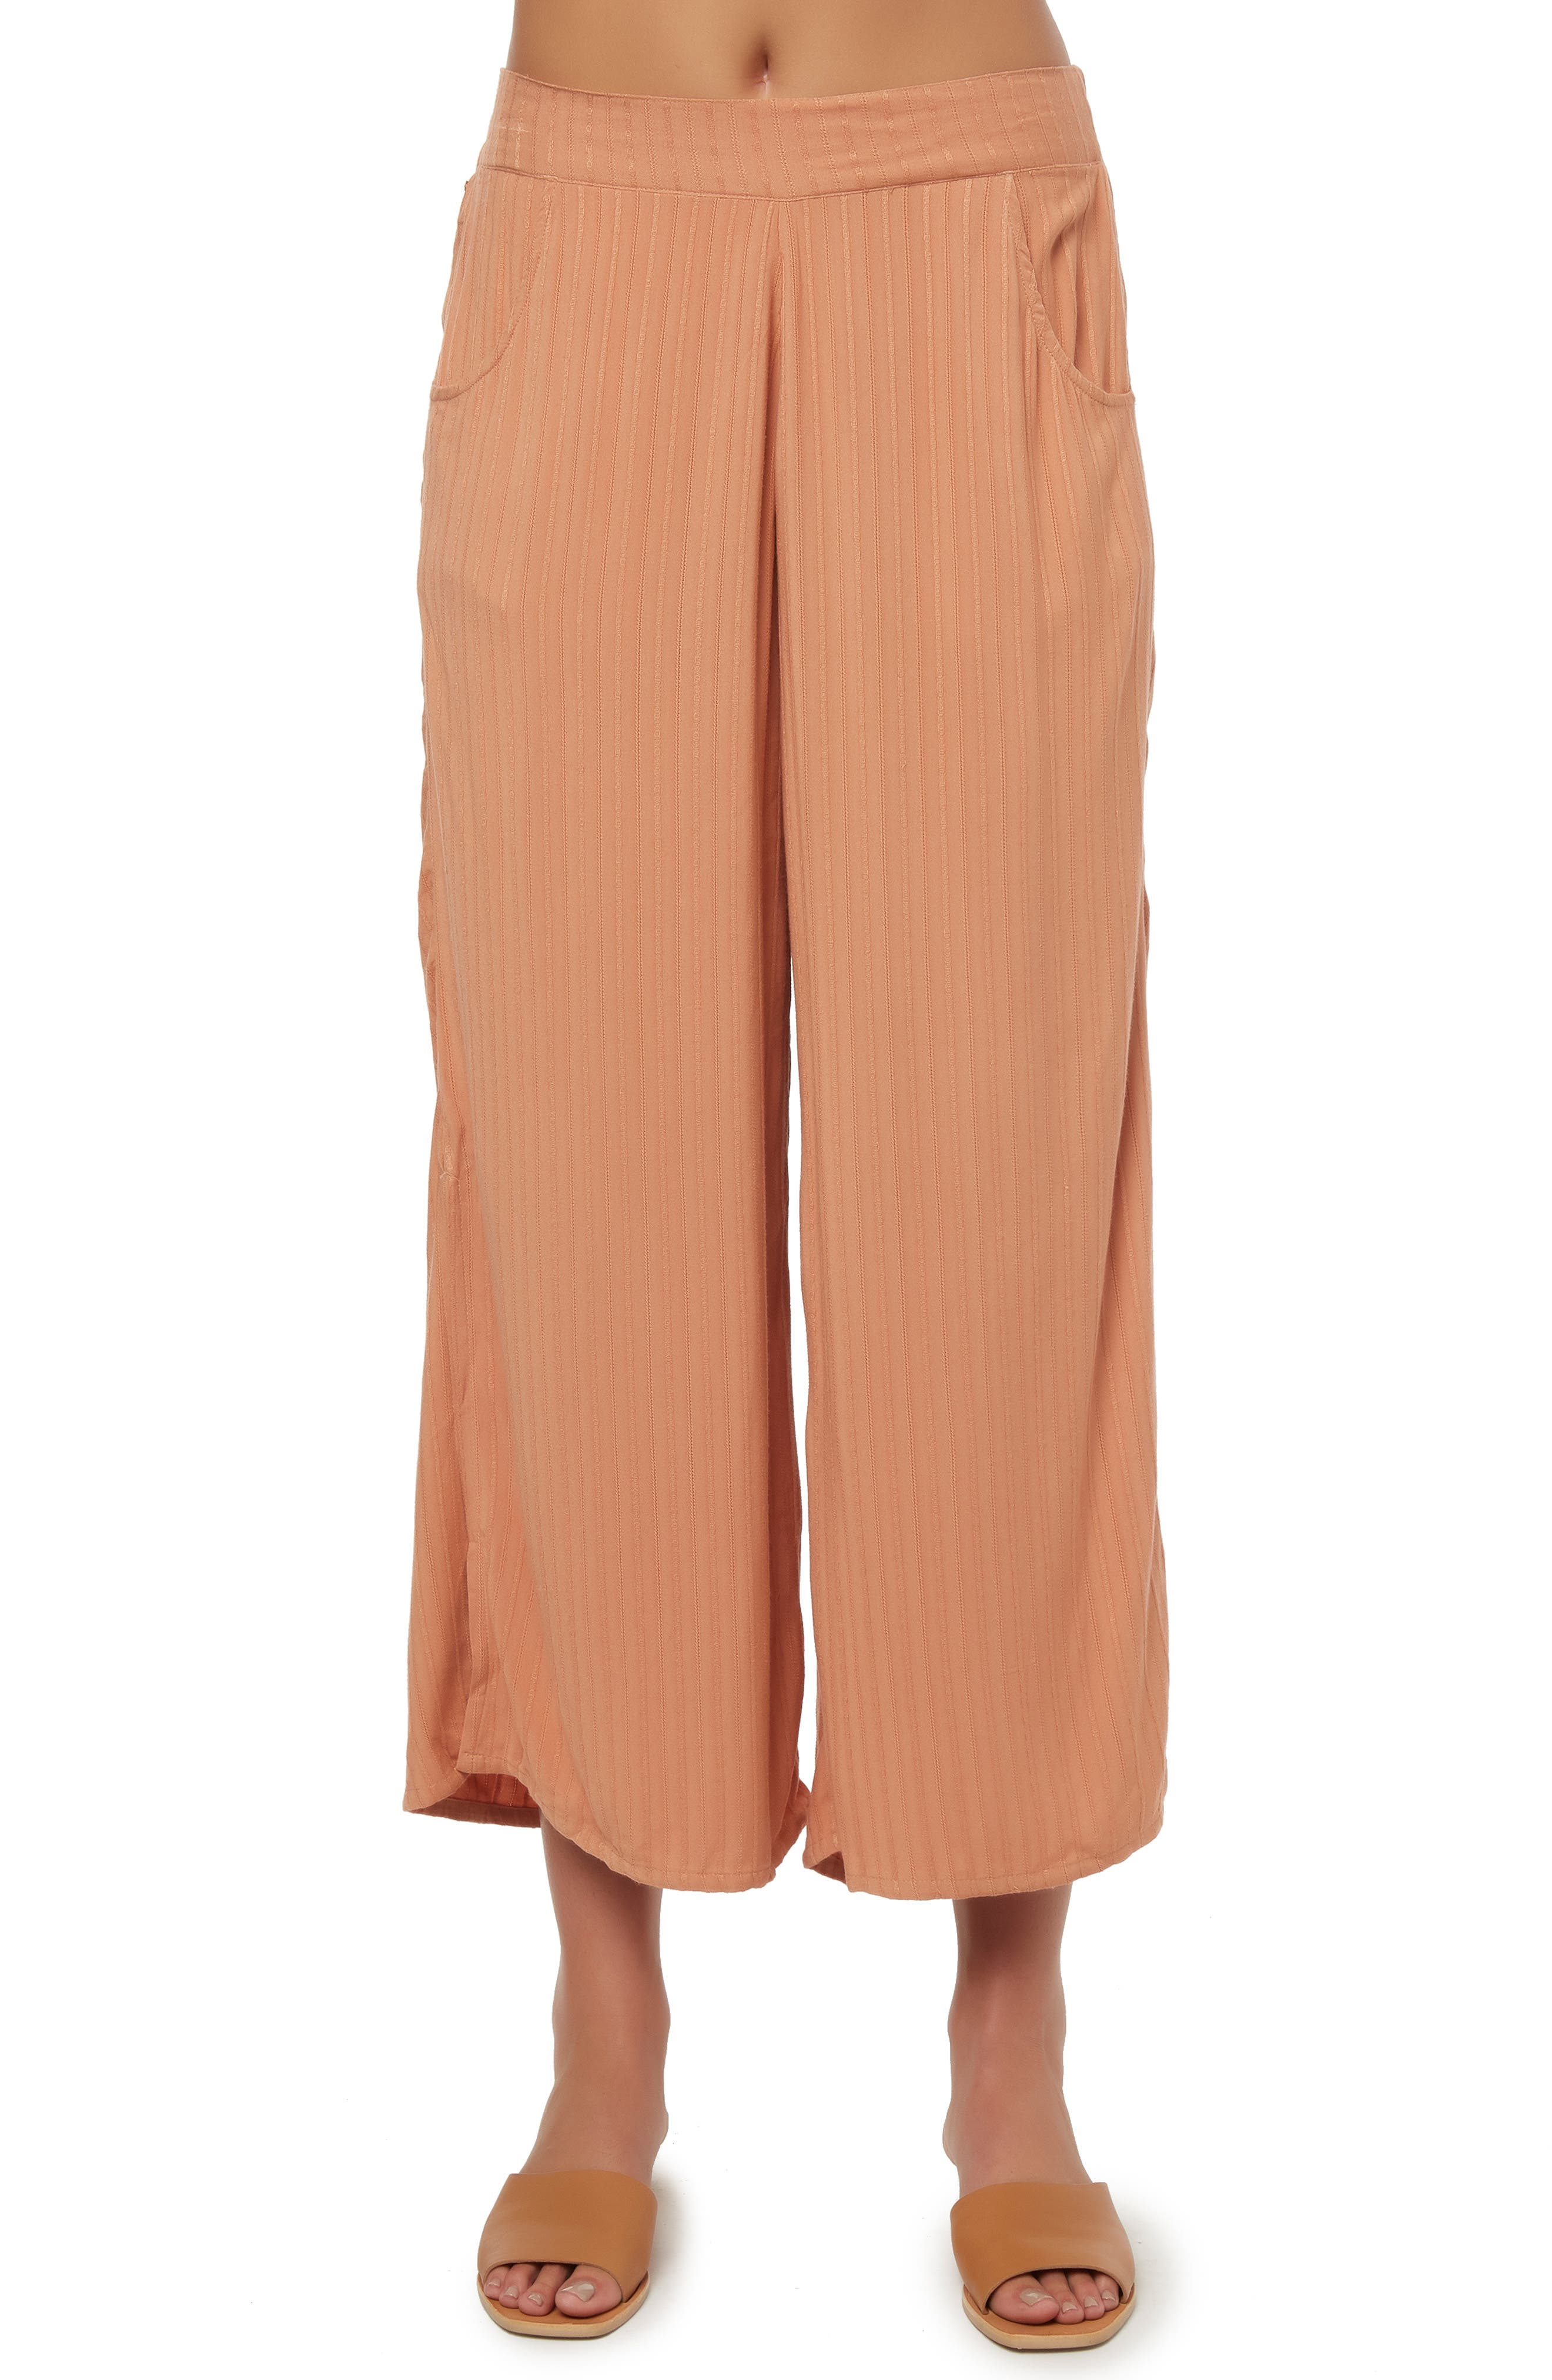 O'NEILL Rayna Wide Leg Crop Pants, Main, color, CORK